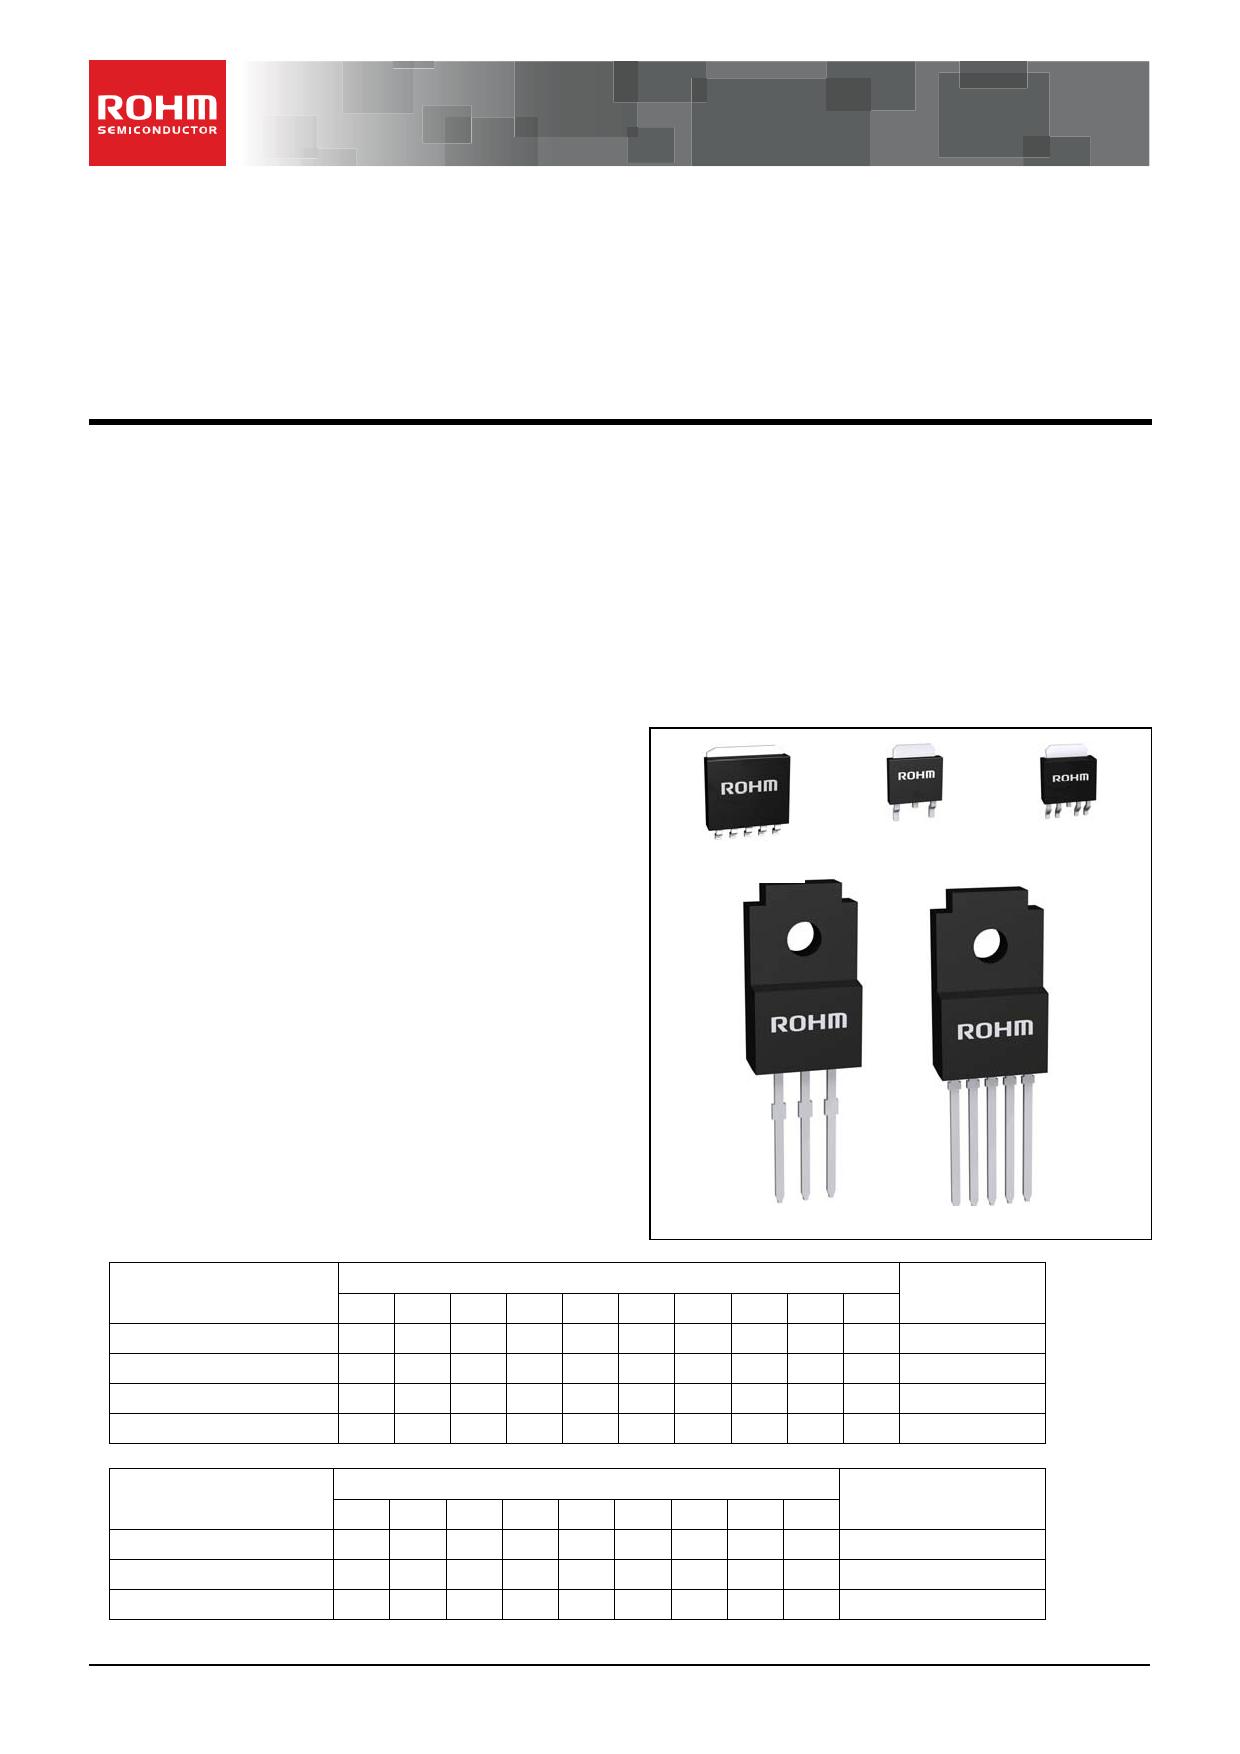 BA07CC0WFP-E2 datasheet